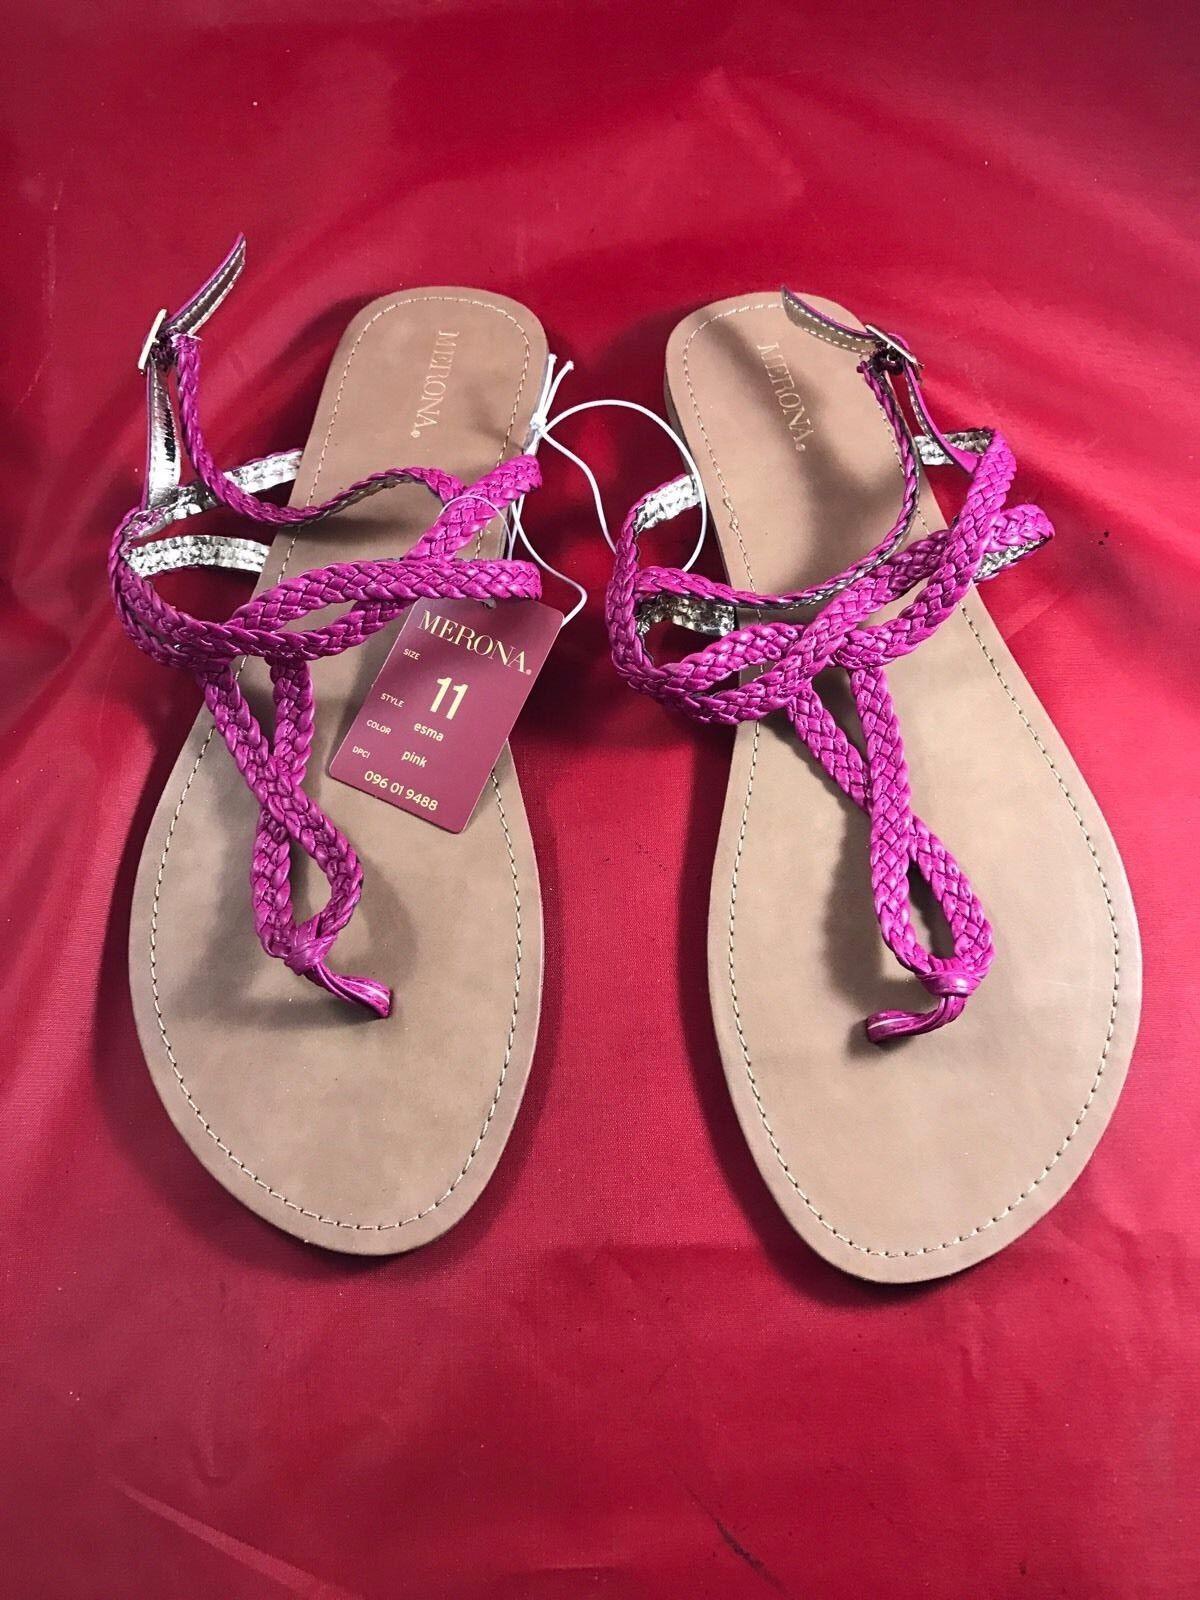 Merona Womens Esma Pink Sandals 11 Size 11 Sandals fb9036